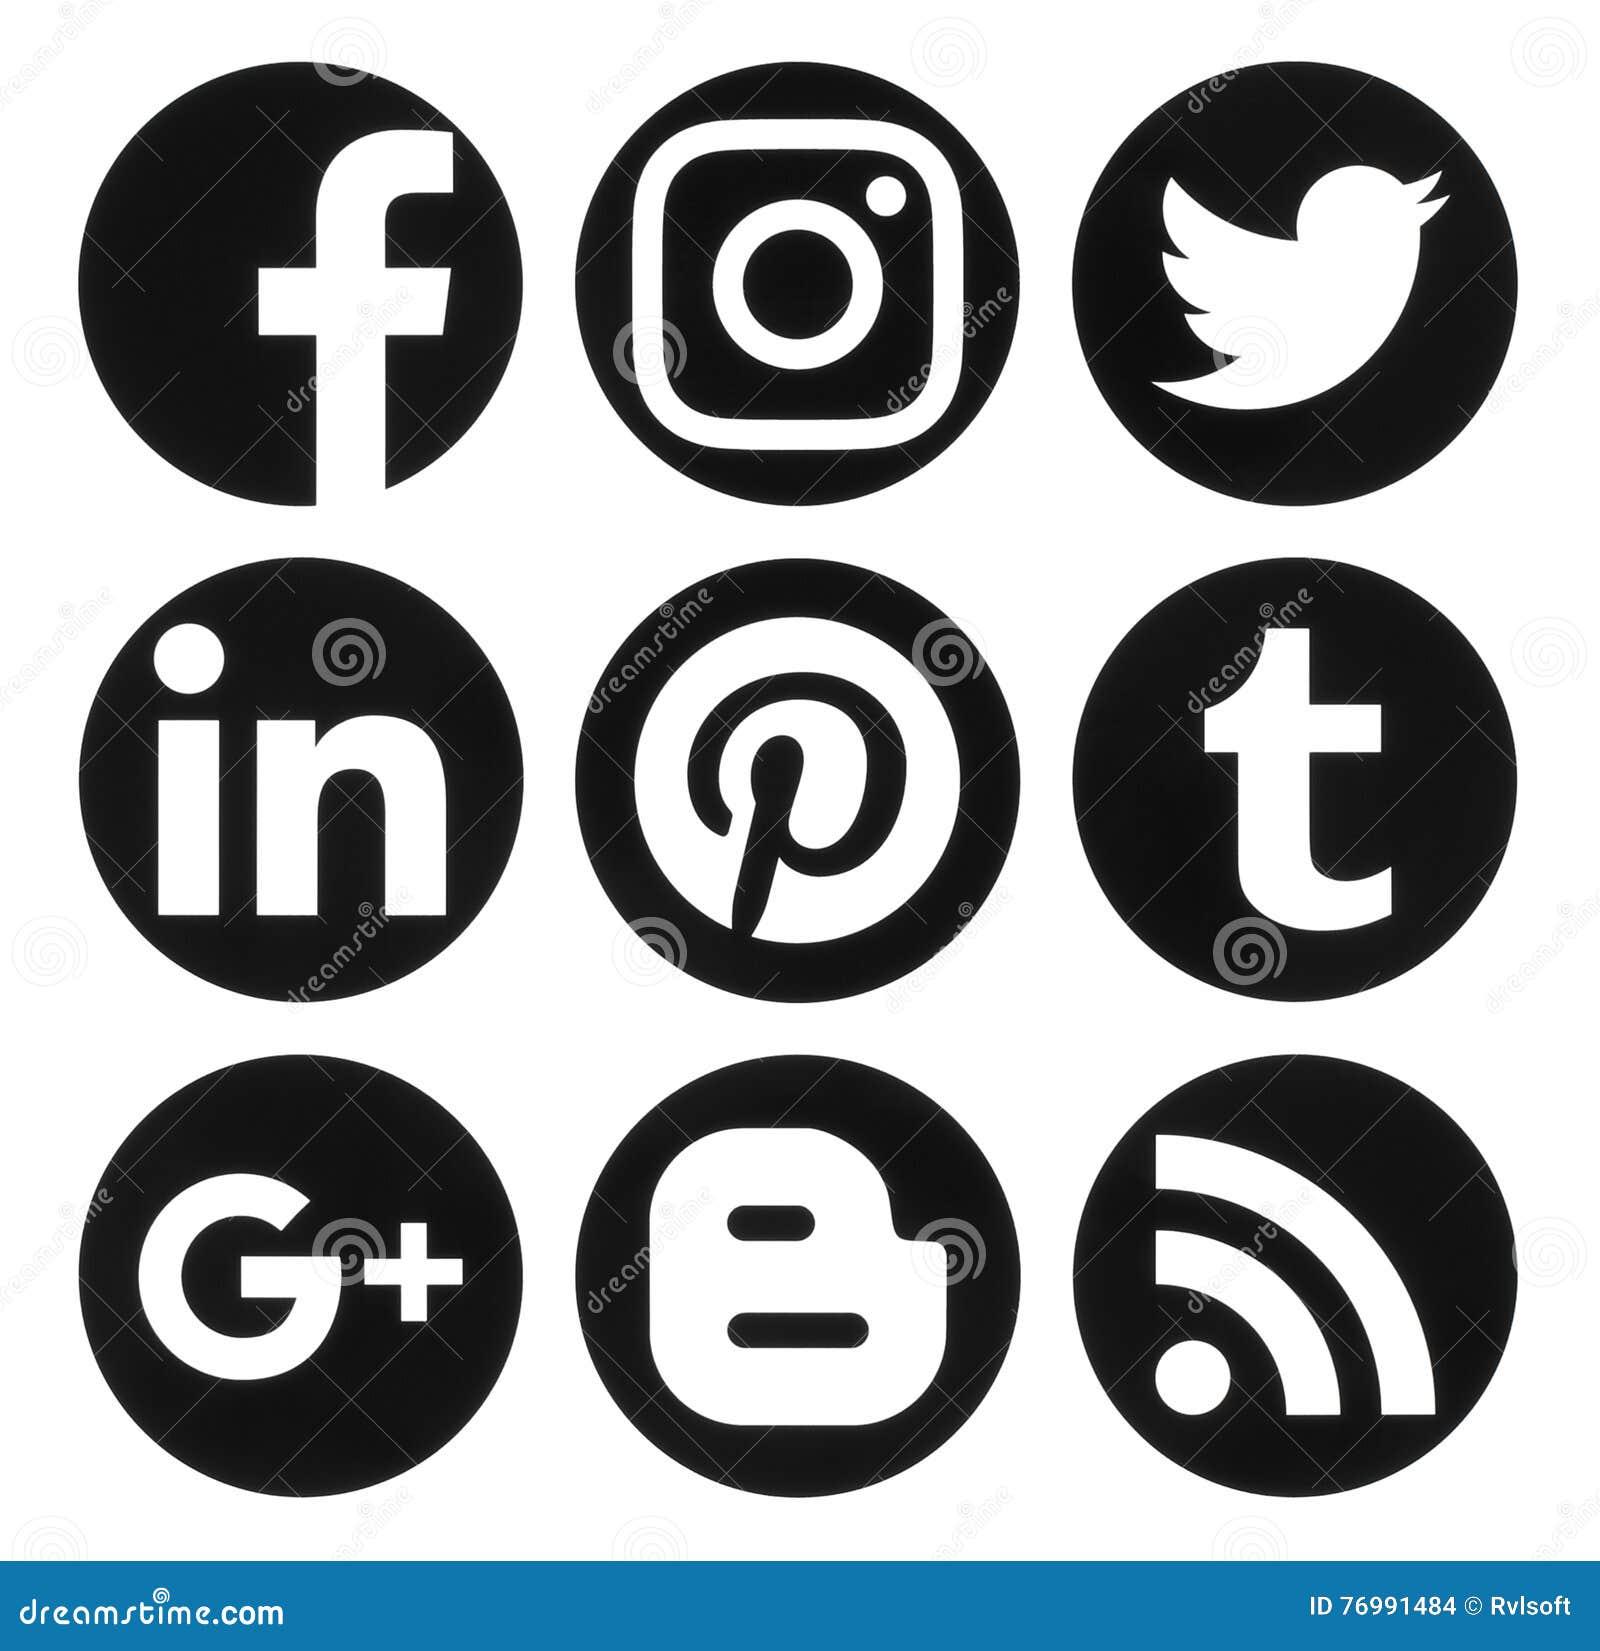 social media logos. editorial stock photo. download collection of popular circle black social media logos